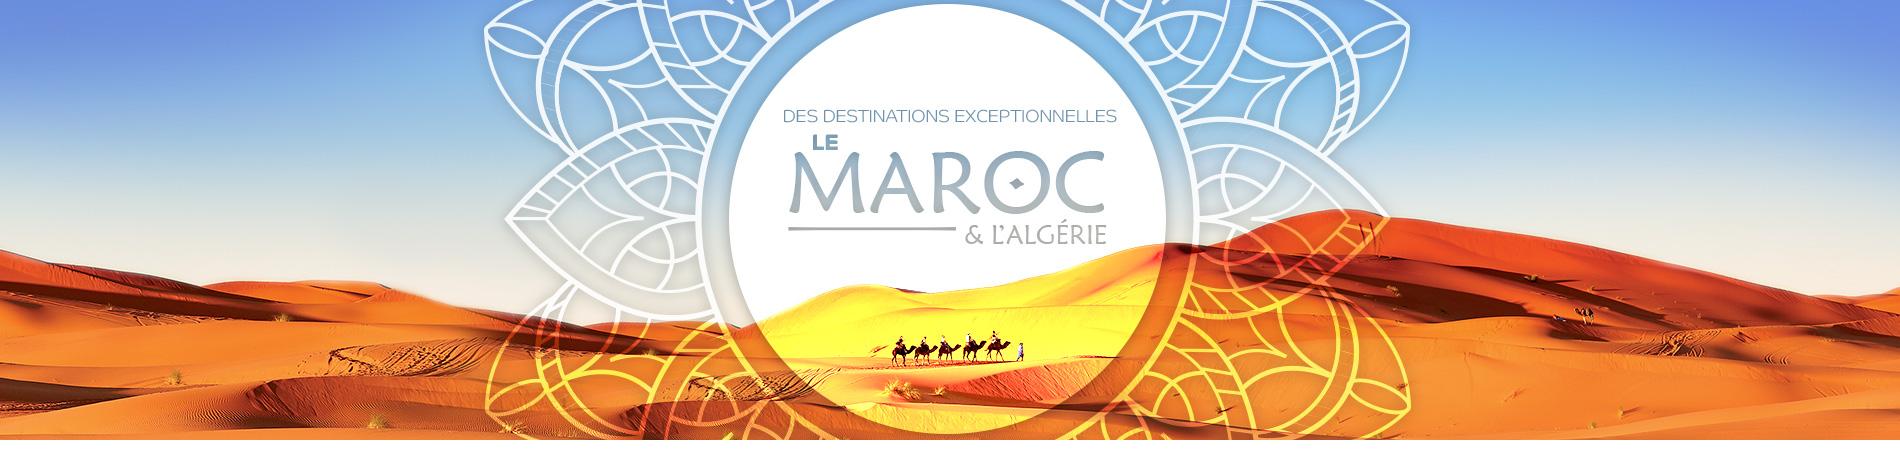 voyage maroc salaun